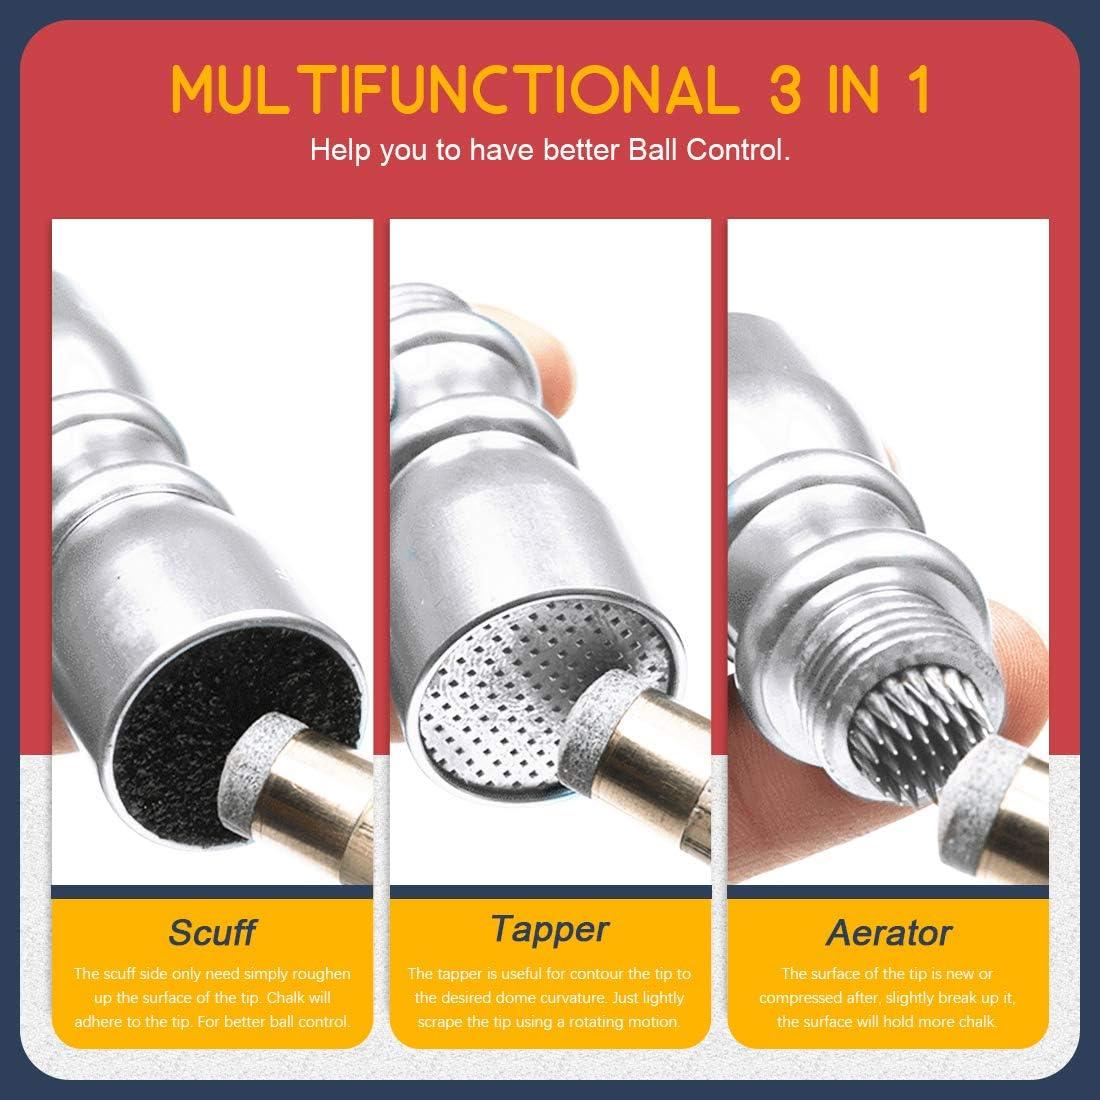 Hilitchi Multifunction Bowtie Snooker Billiard Pool Cue Tip Stick Shaper Repair Tools Aerator Scuffer Shaper 3 in 1 Tool